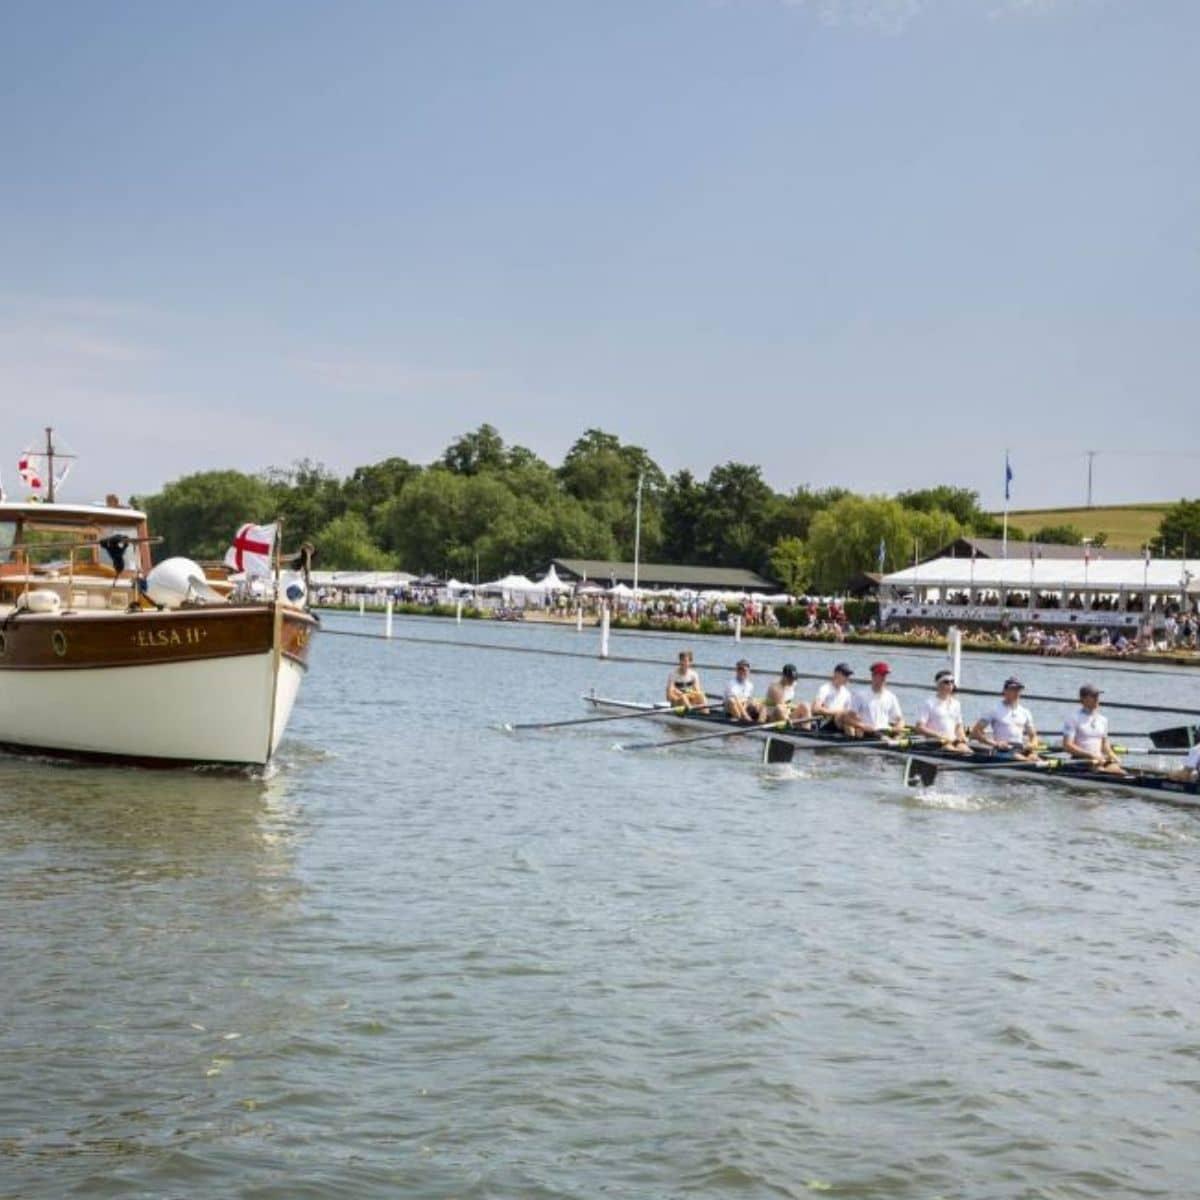 Henley Royal Regatta event